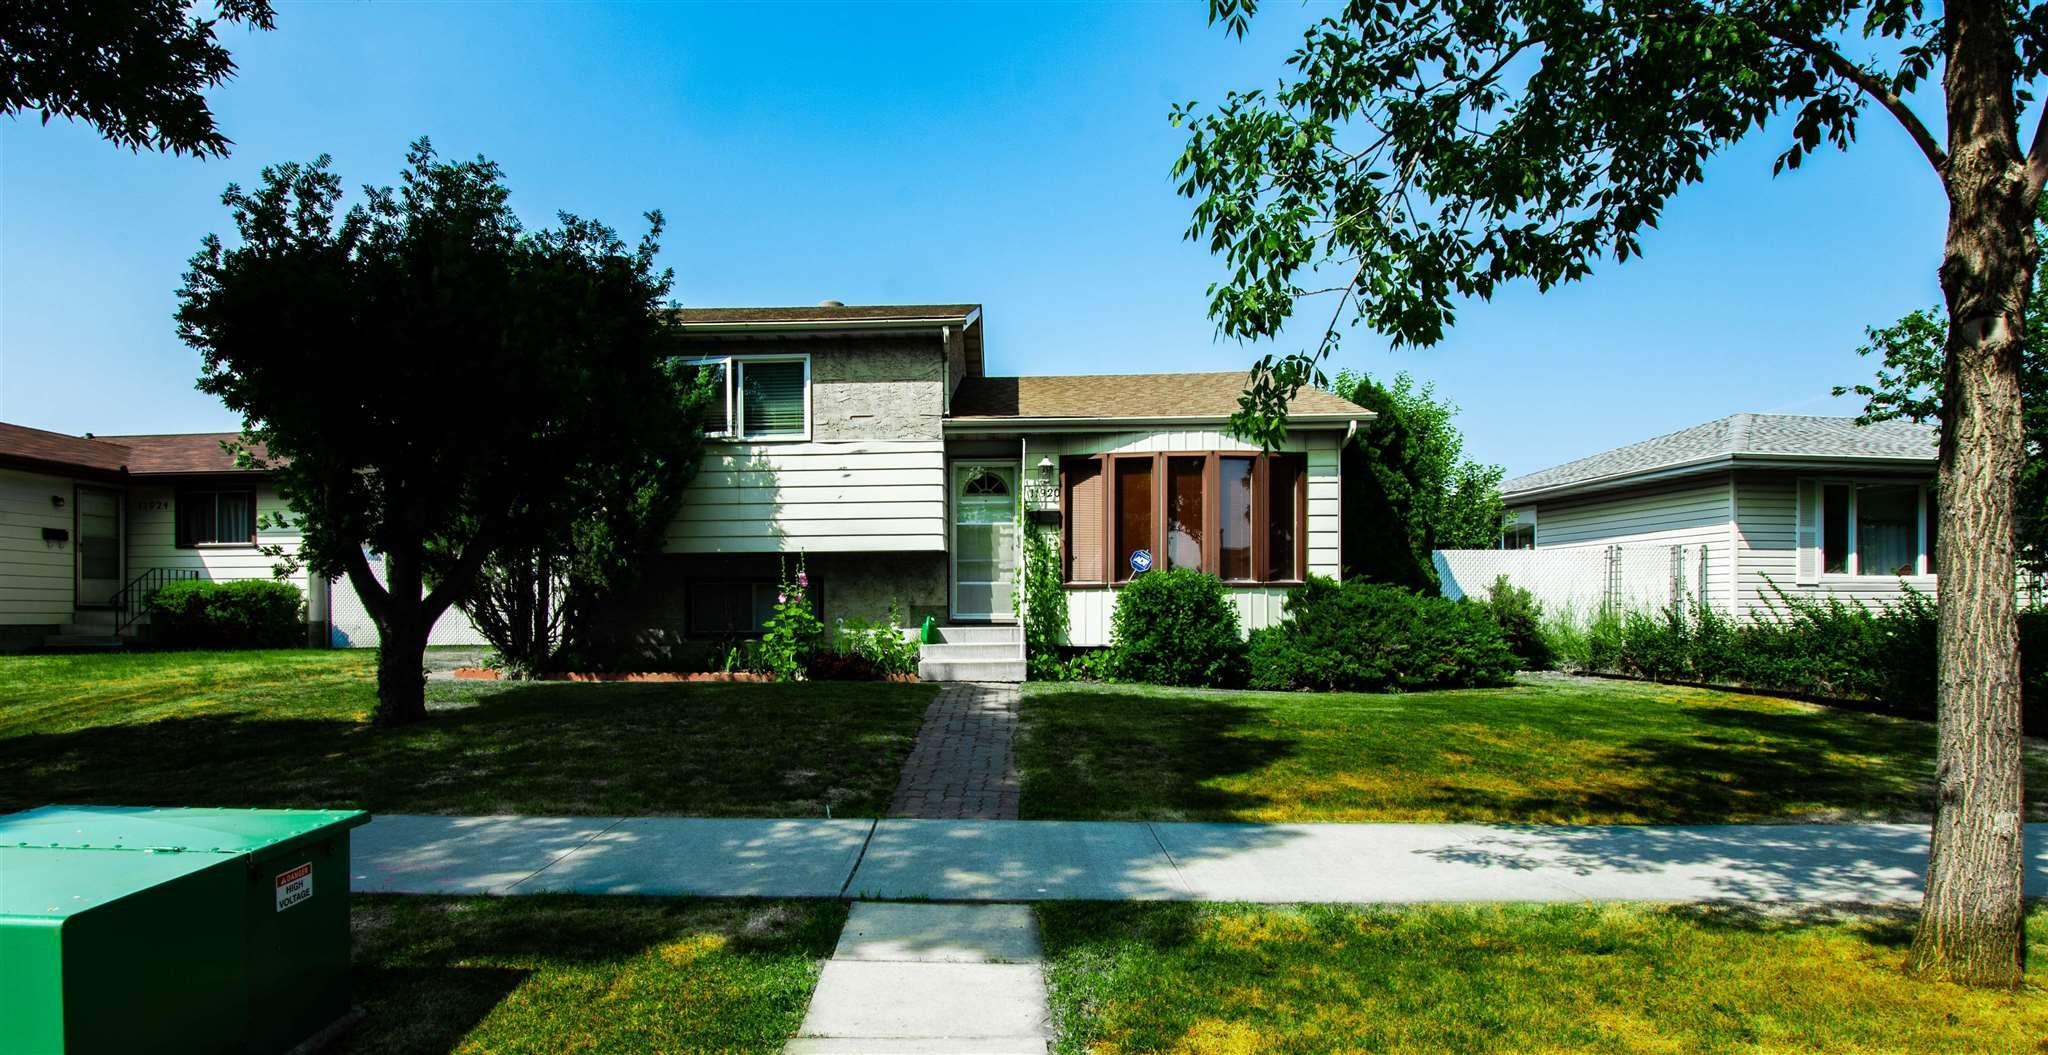 Main Photo: 11920 139 Avenue in Edmonton: Zone 27 House for sale : MLS®# E4254778